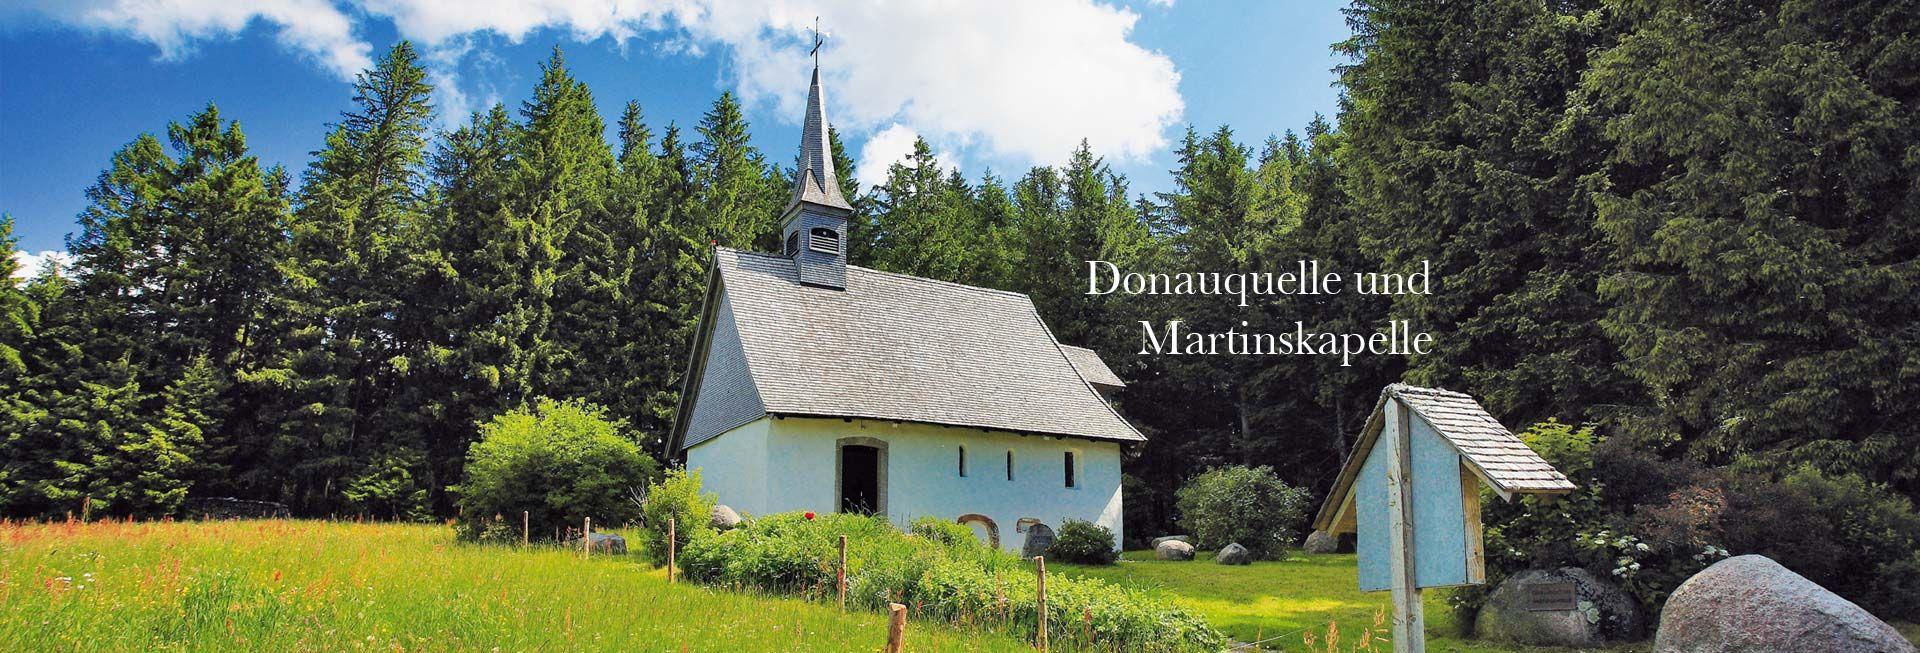 Kolmenhof Themenhead Donauquelle Martinskapelle 07102015